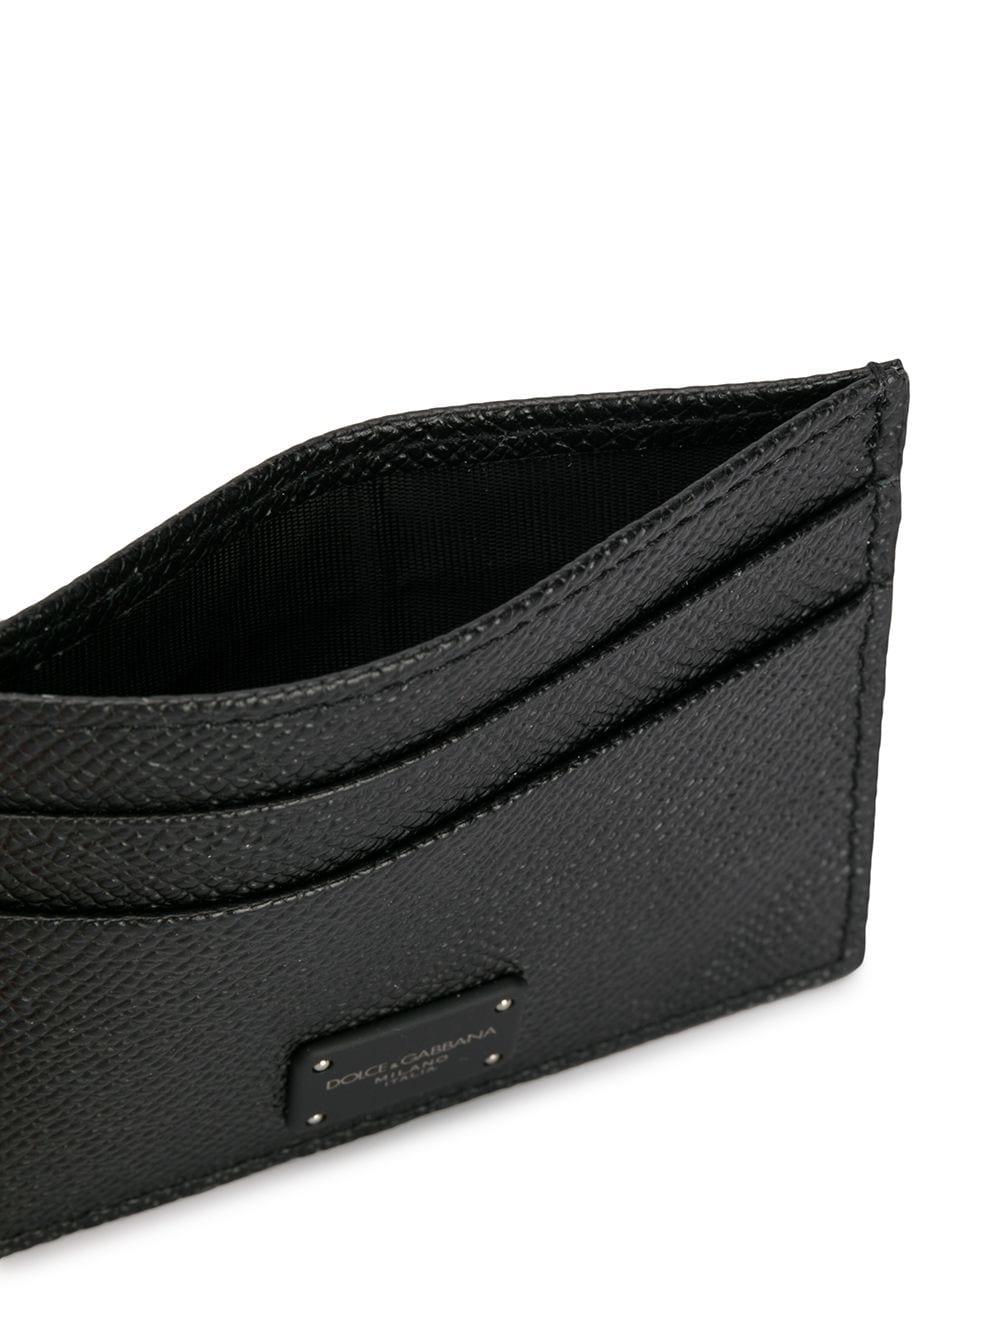 black saffiano leather cardholder with front logo patch DOLCE & GABBANA |  | BP0330-AZ60280999